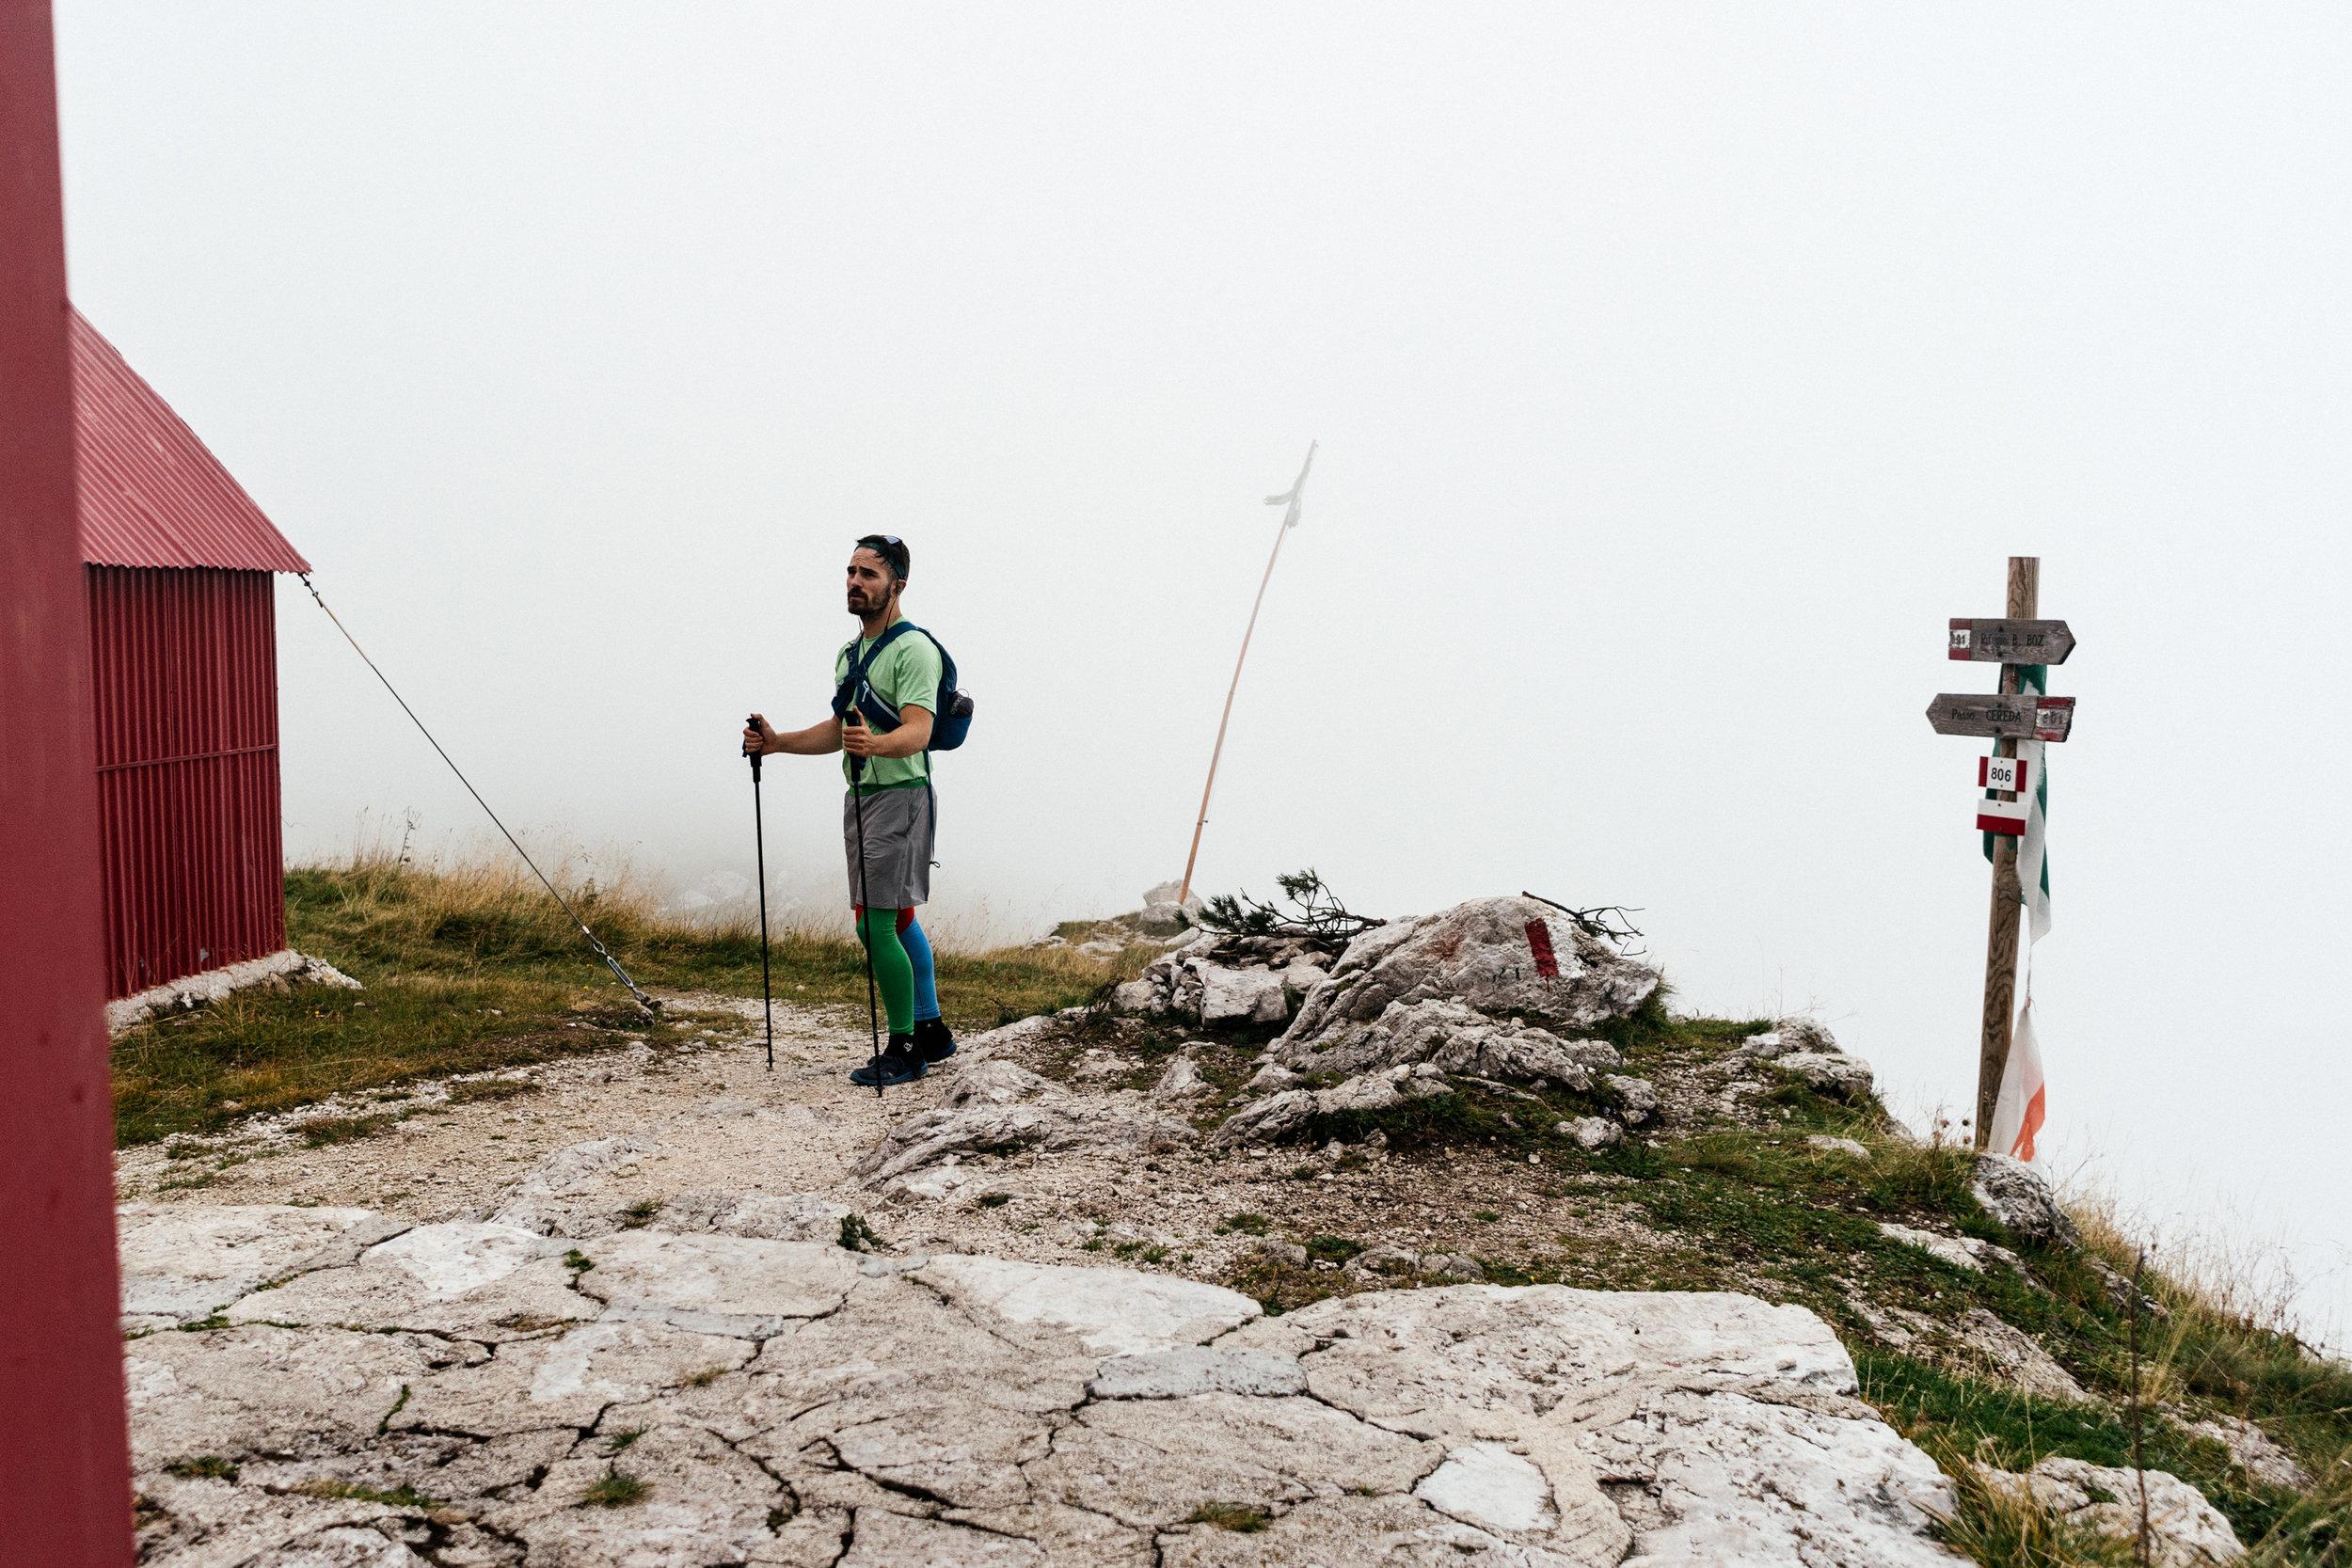 Dolomites-ChrisBrinleeJr-SEP17-22.jpg